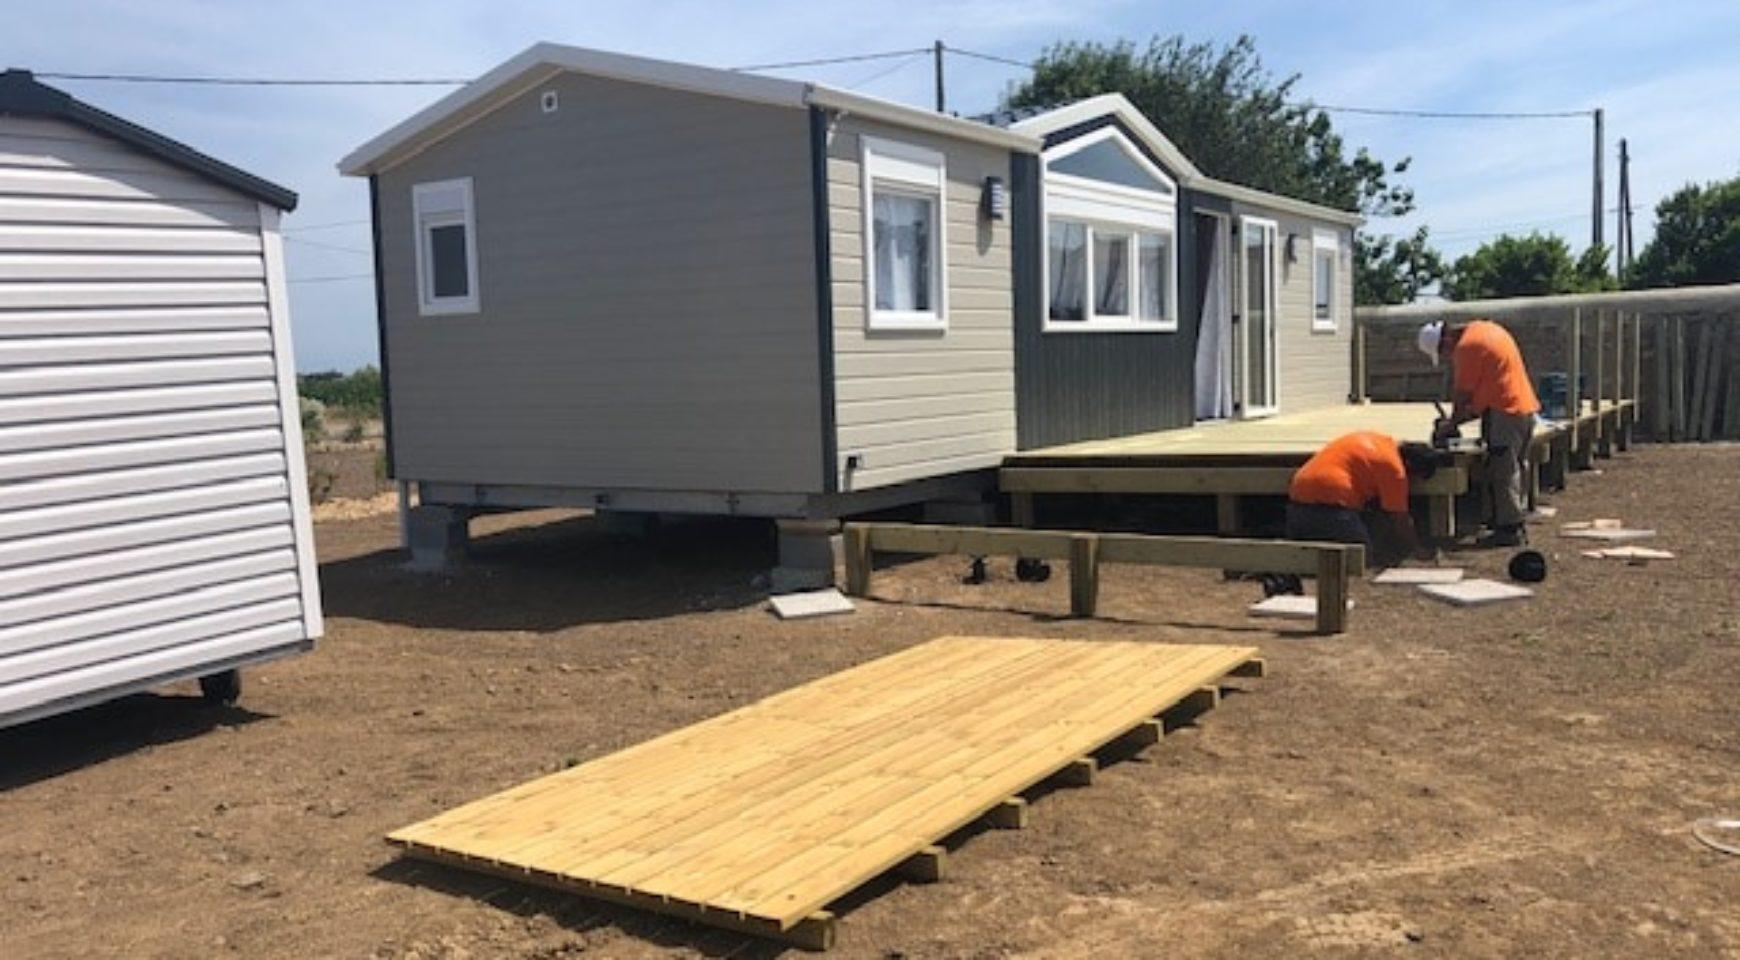 Installation De 9 Mobiles-Home Sur Un Prl - Mobil Home En ... concernant Abri Dacri Occasion